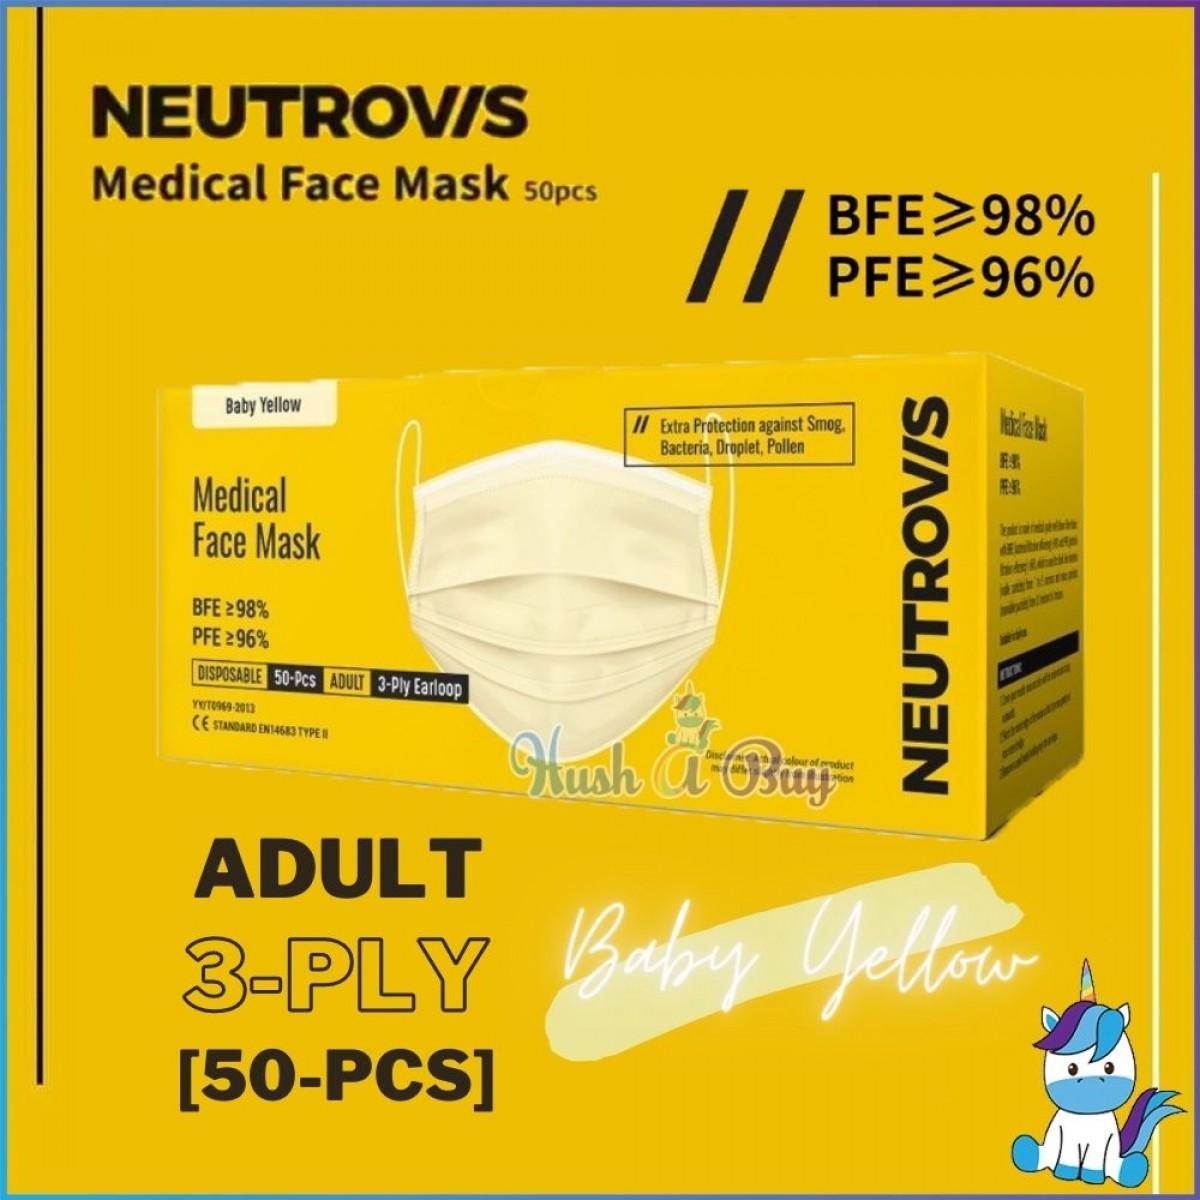 Neutrovis Medical Face Mask 50pcs